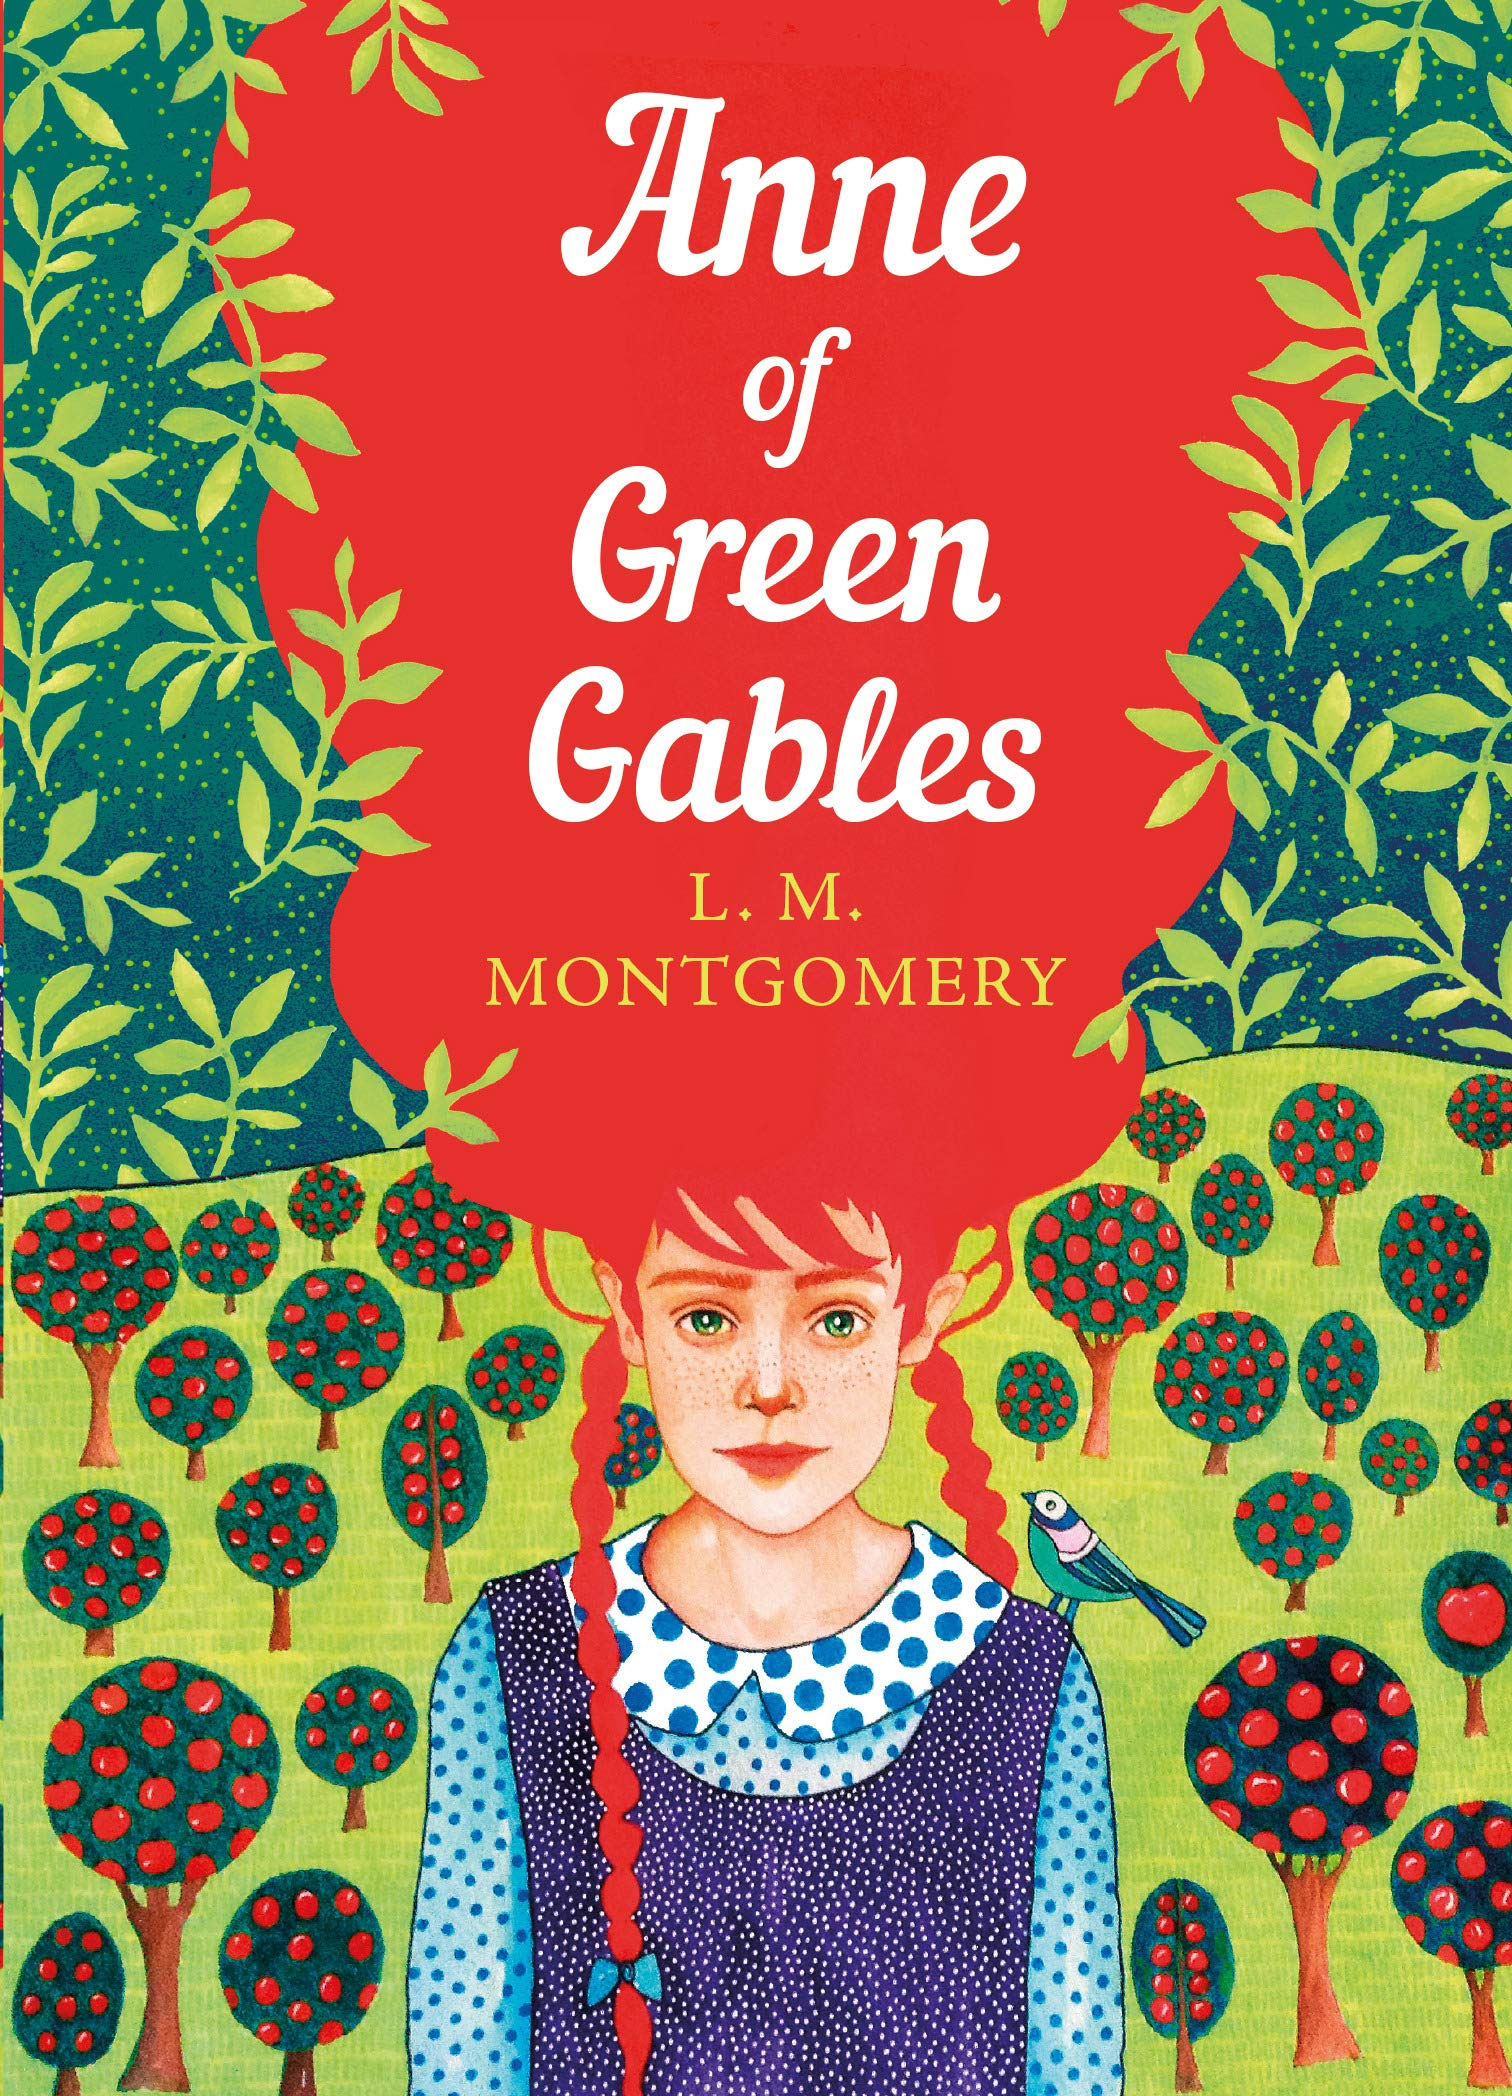 Anne of Green Gables - The Rocketship Bookshop